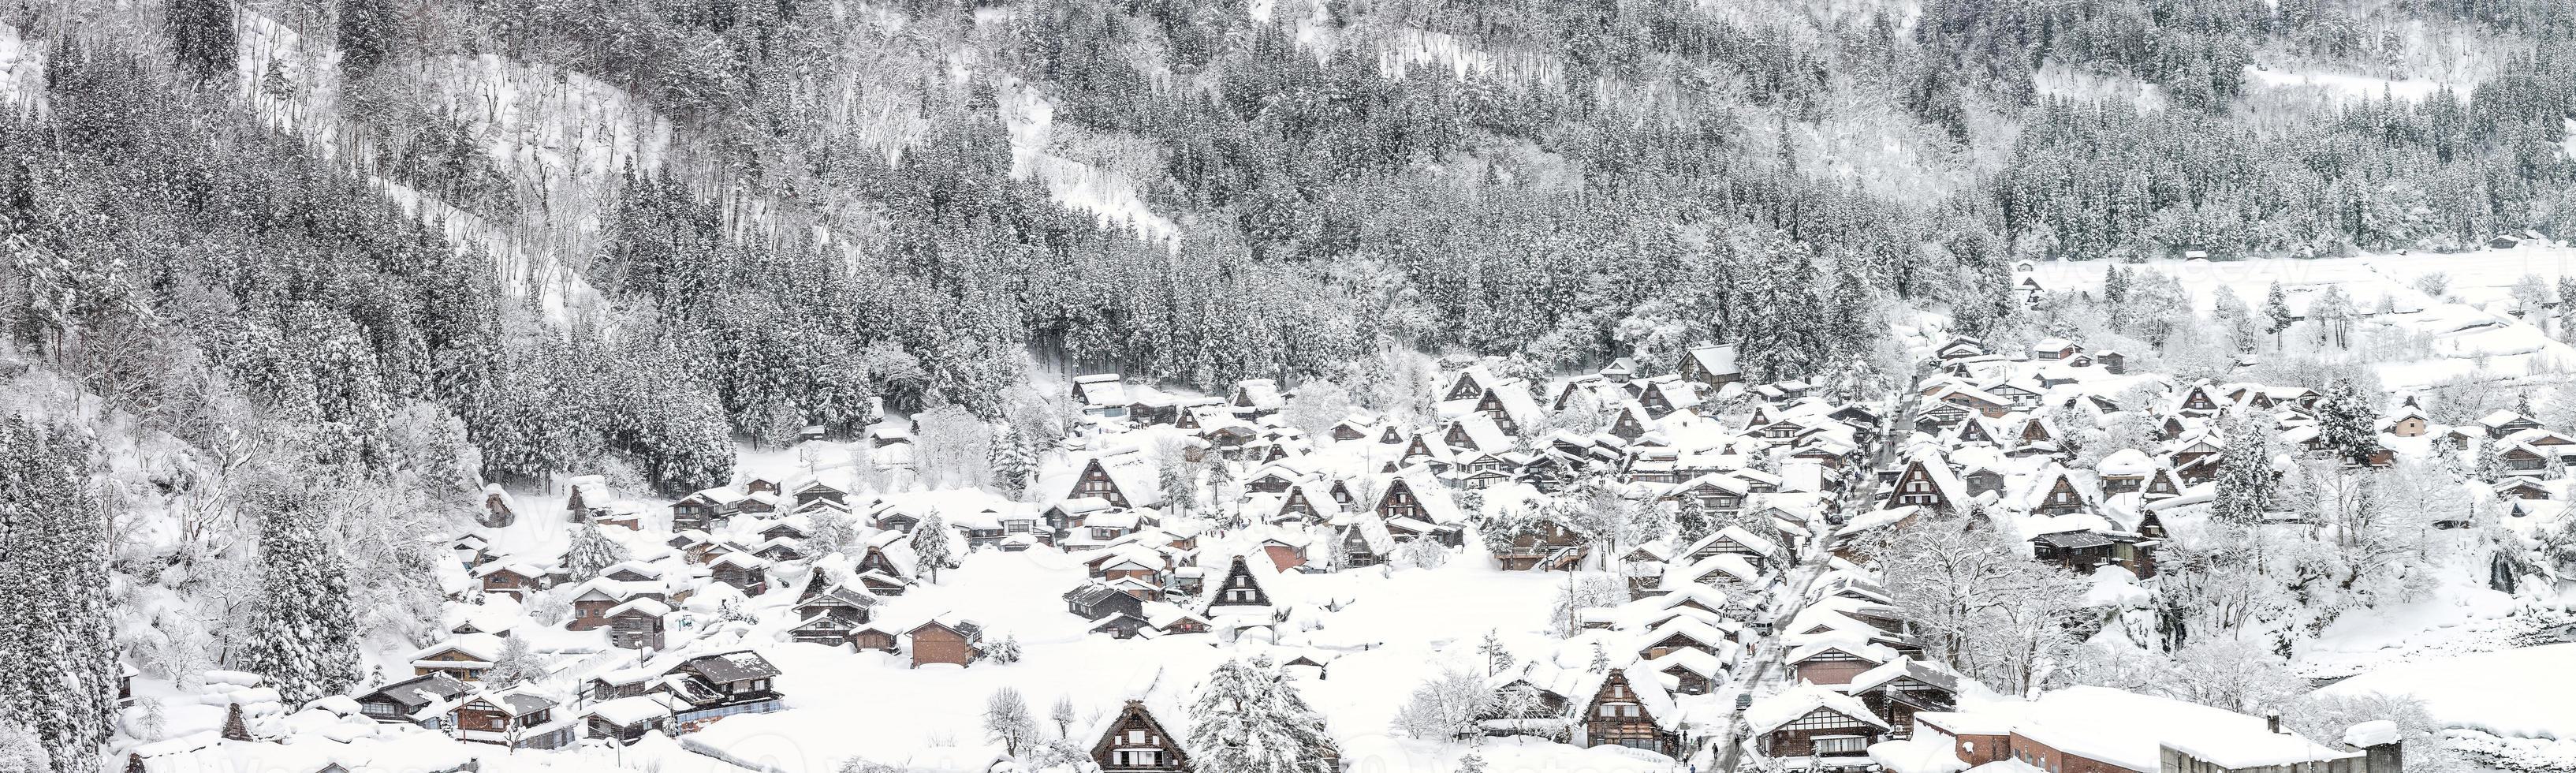 shirakawago d'hiver photo